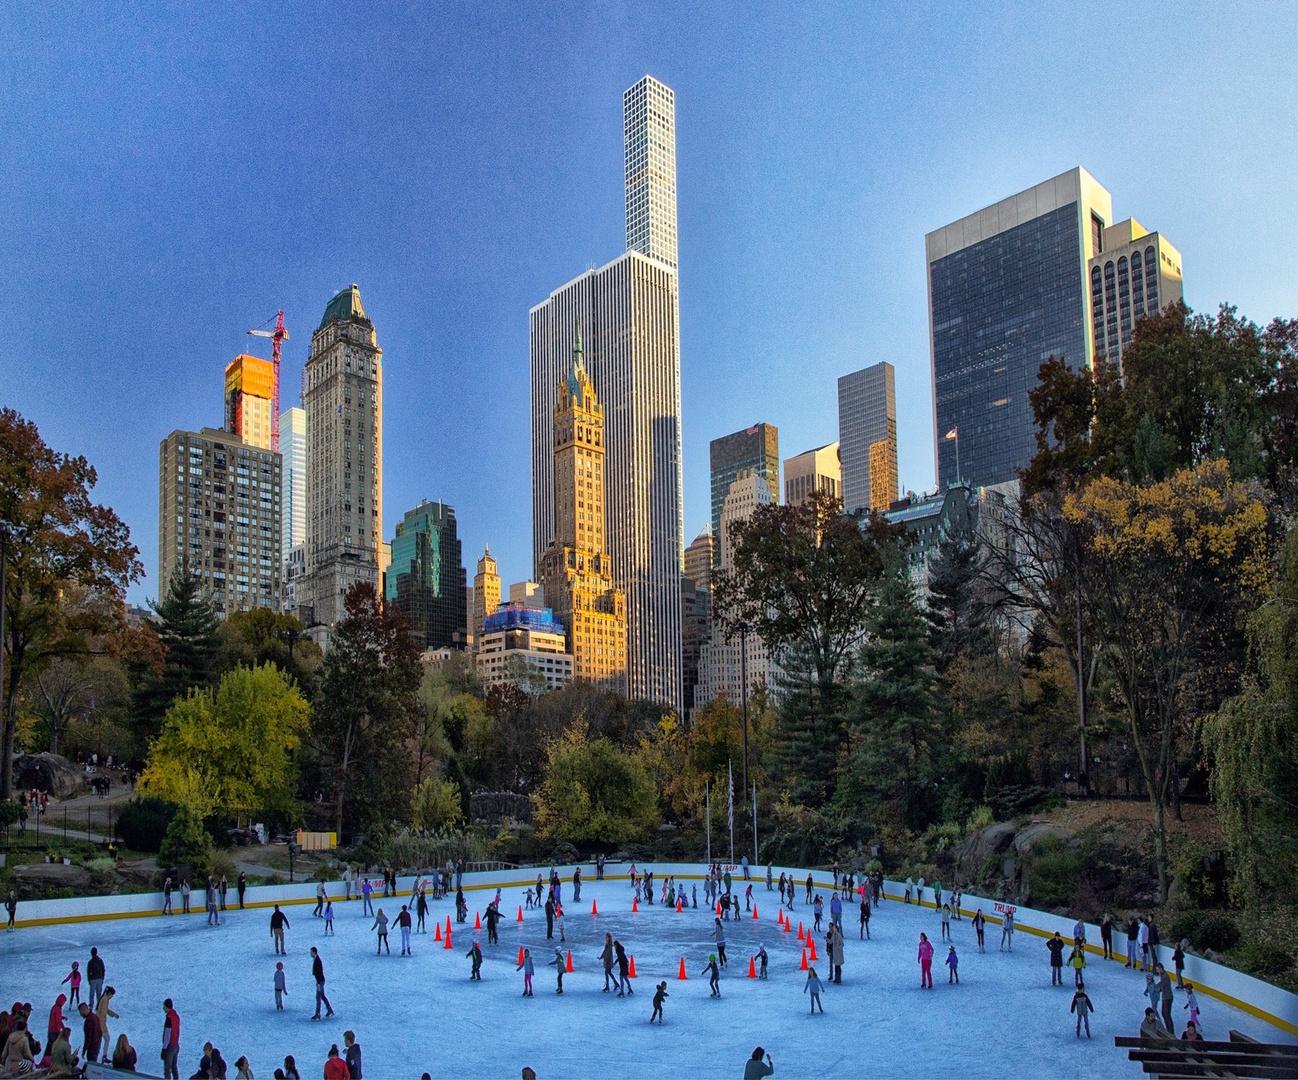 Ice Skating at Central Park